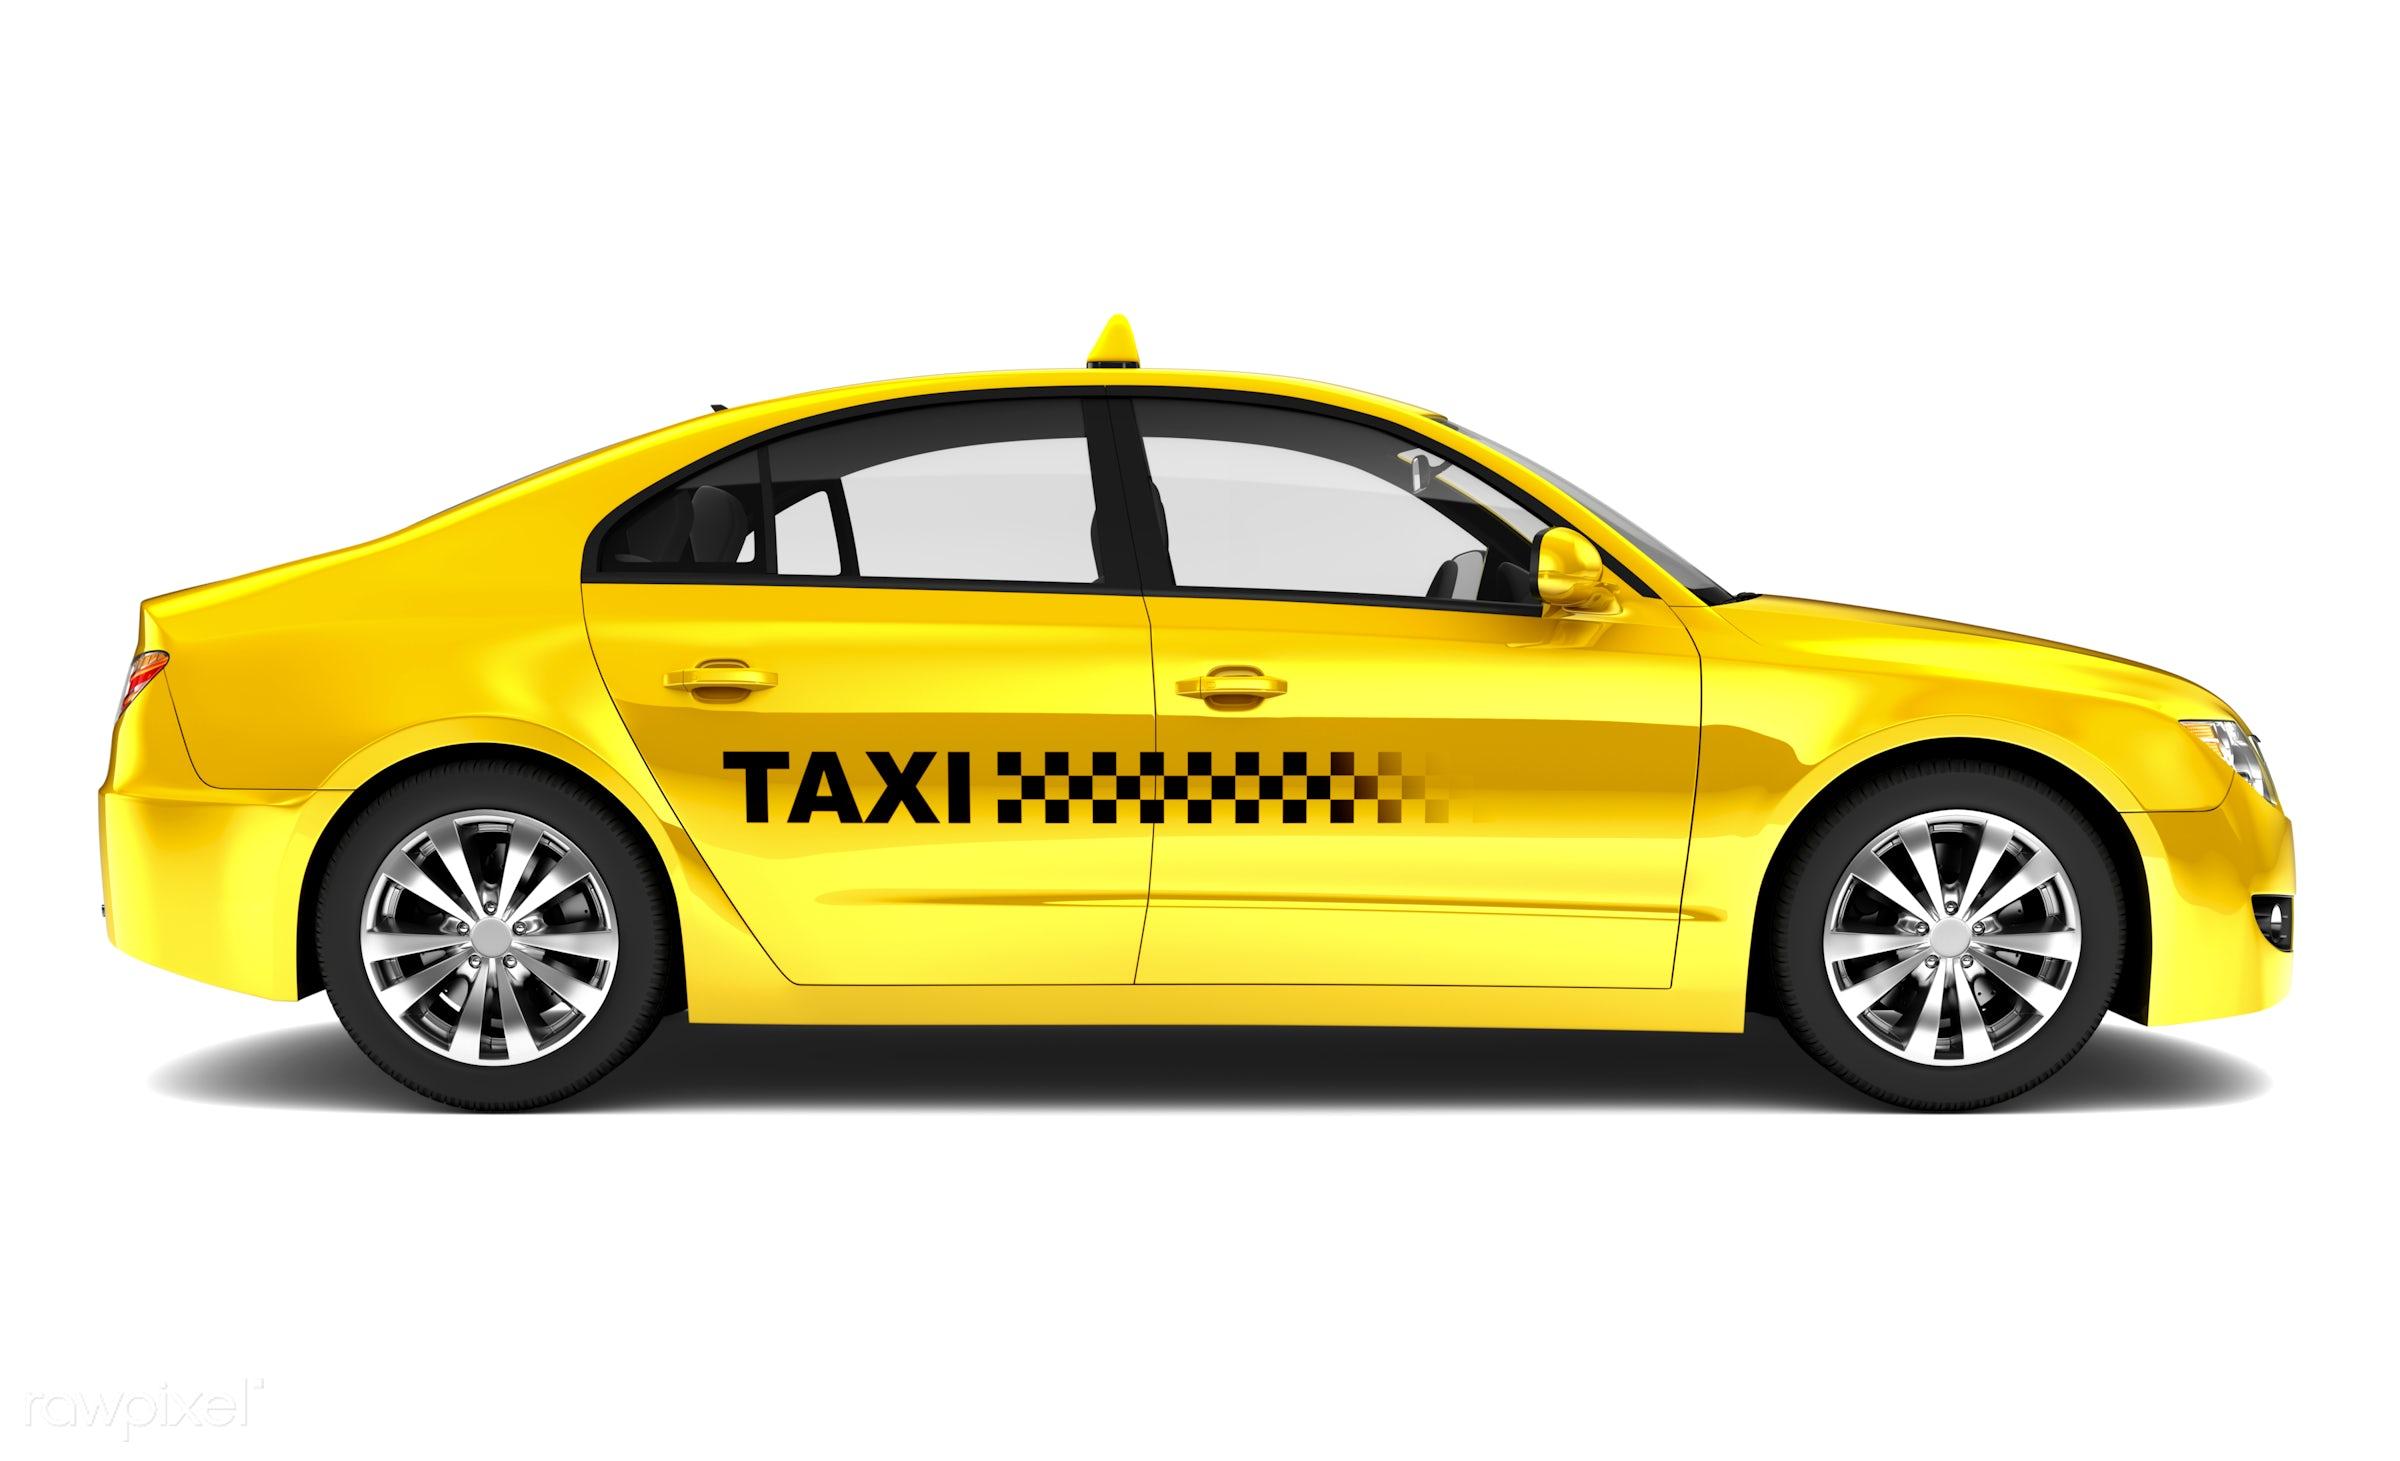 Three dimensional image of car - 3d, automobile, automotive, brandless, cab, car, concept car, graphic, holiday,...